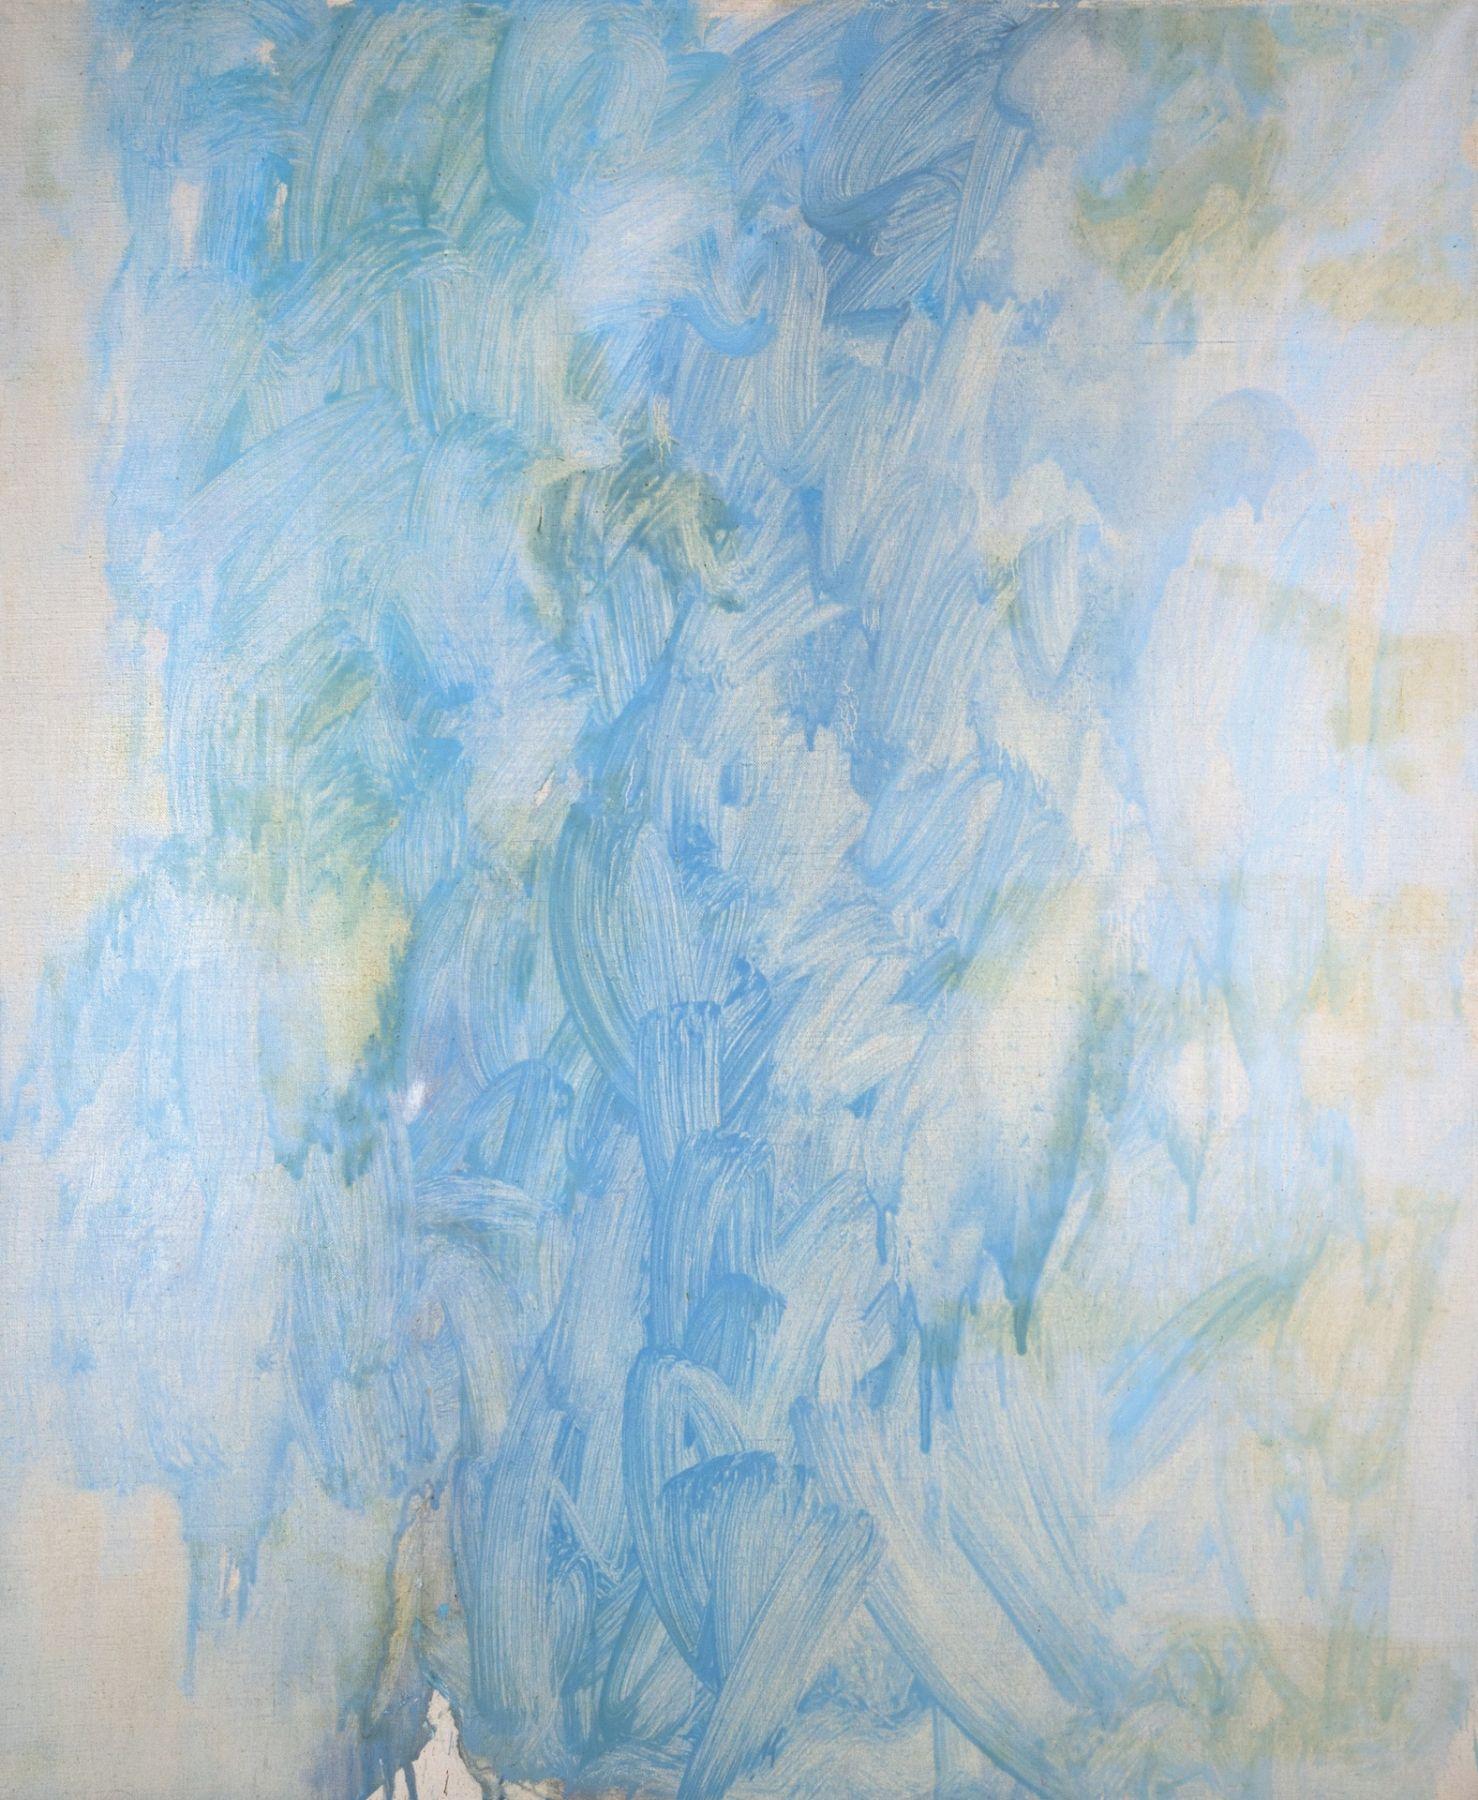 Alejandro Otero, Tela III , 1961. Oil on canvas, 28 11/16 x 23 9/16 in. (73 x 60 cm.)